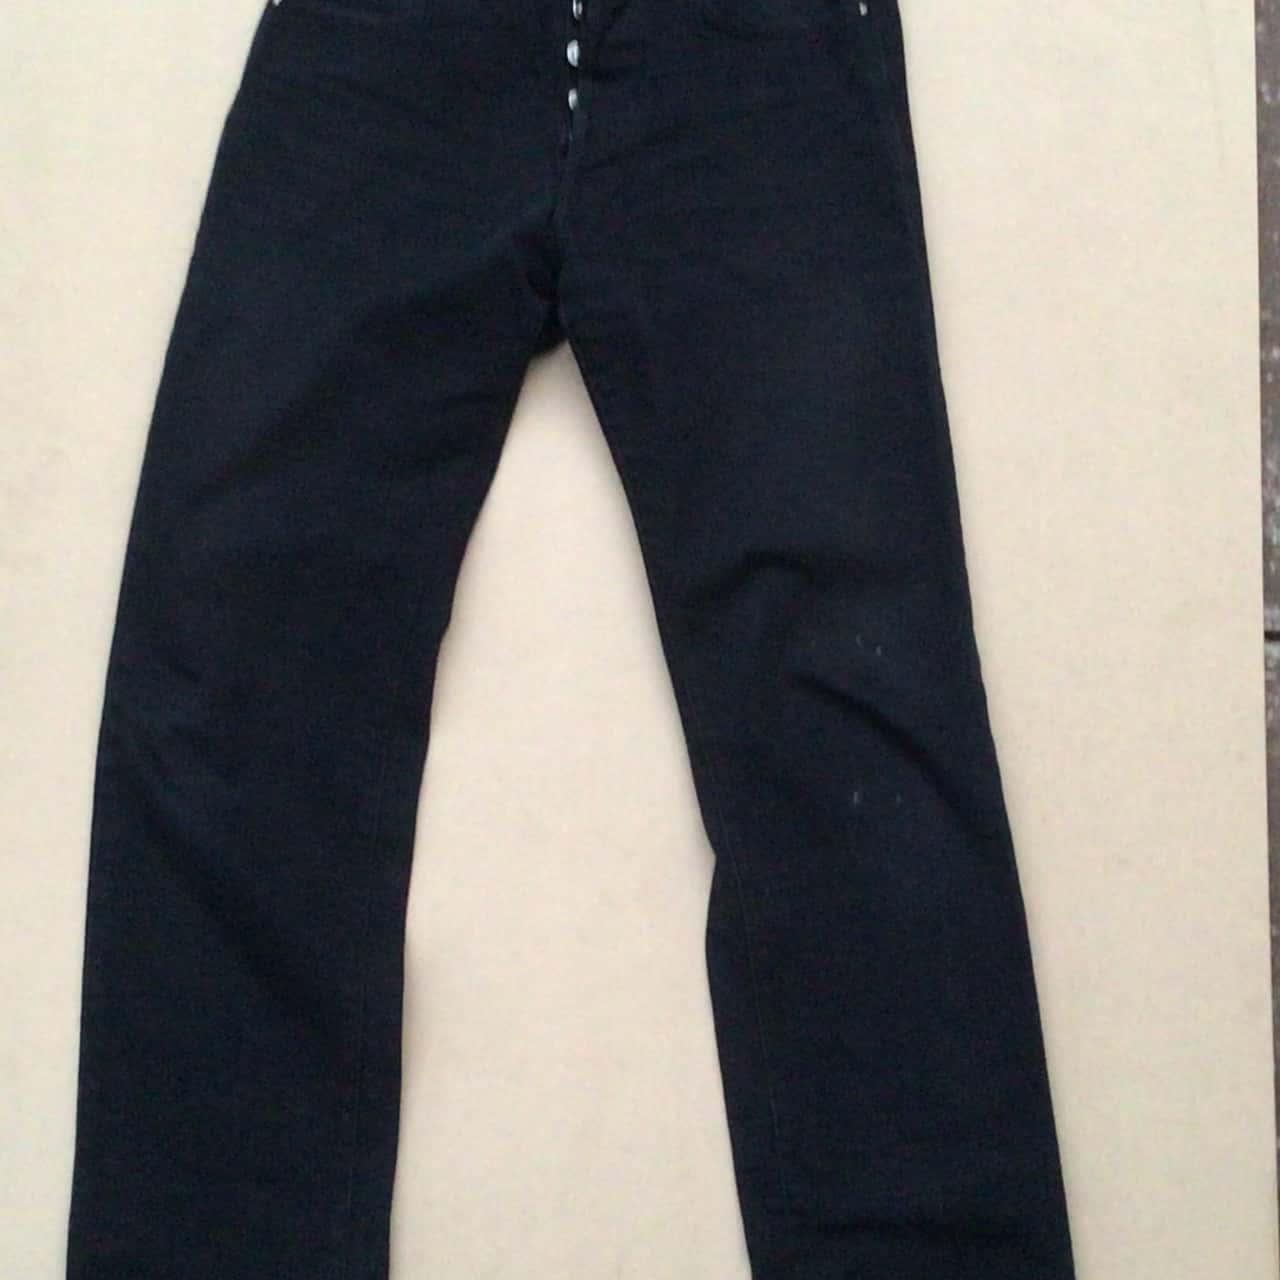 "Mens VERSACE JEANS COUTURE Straight Jeans BUTTON FRONT Black  Size 33"" WAIST (83 cm) Inner leg 84 cm"